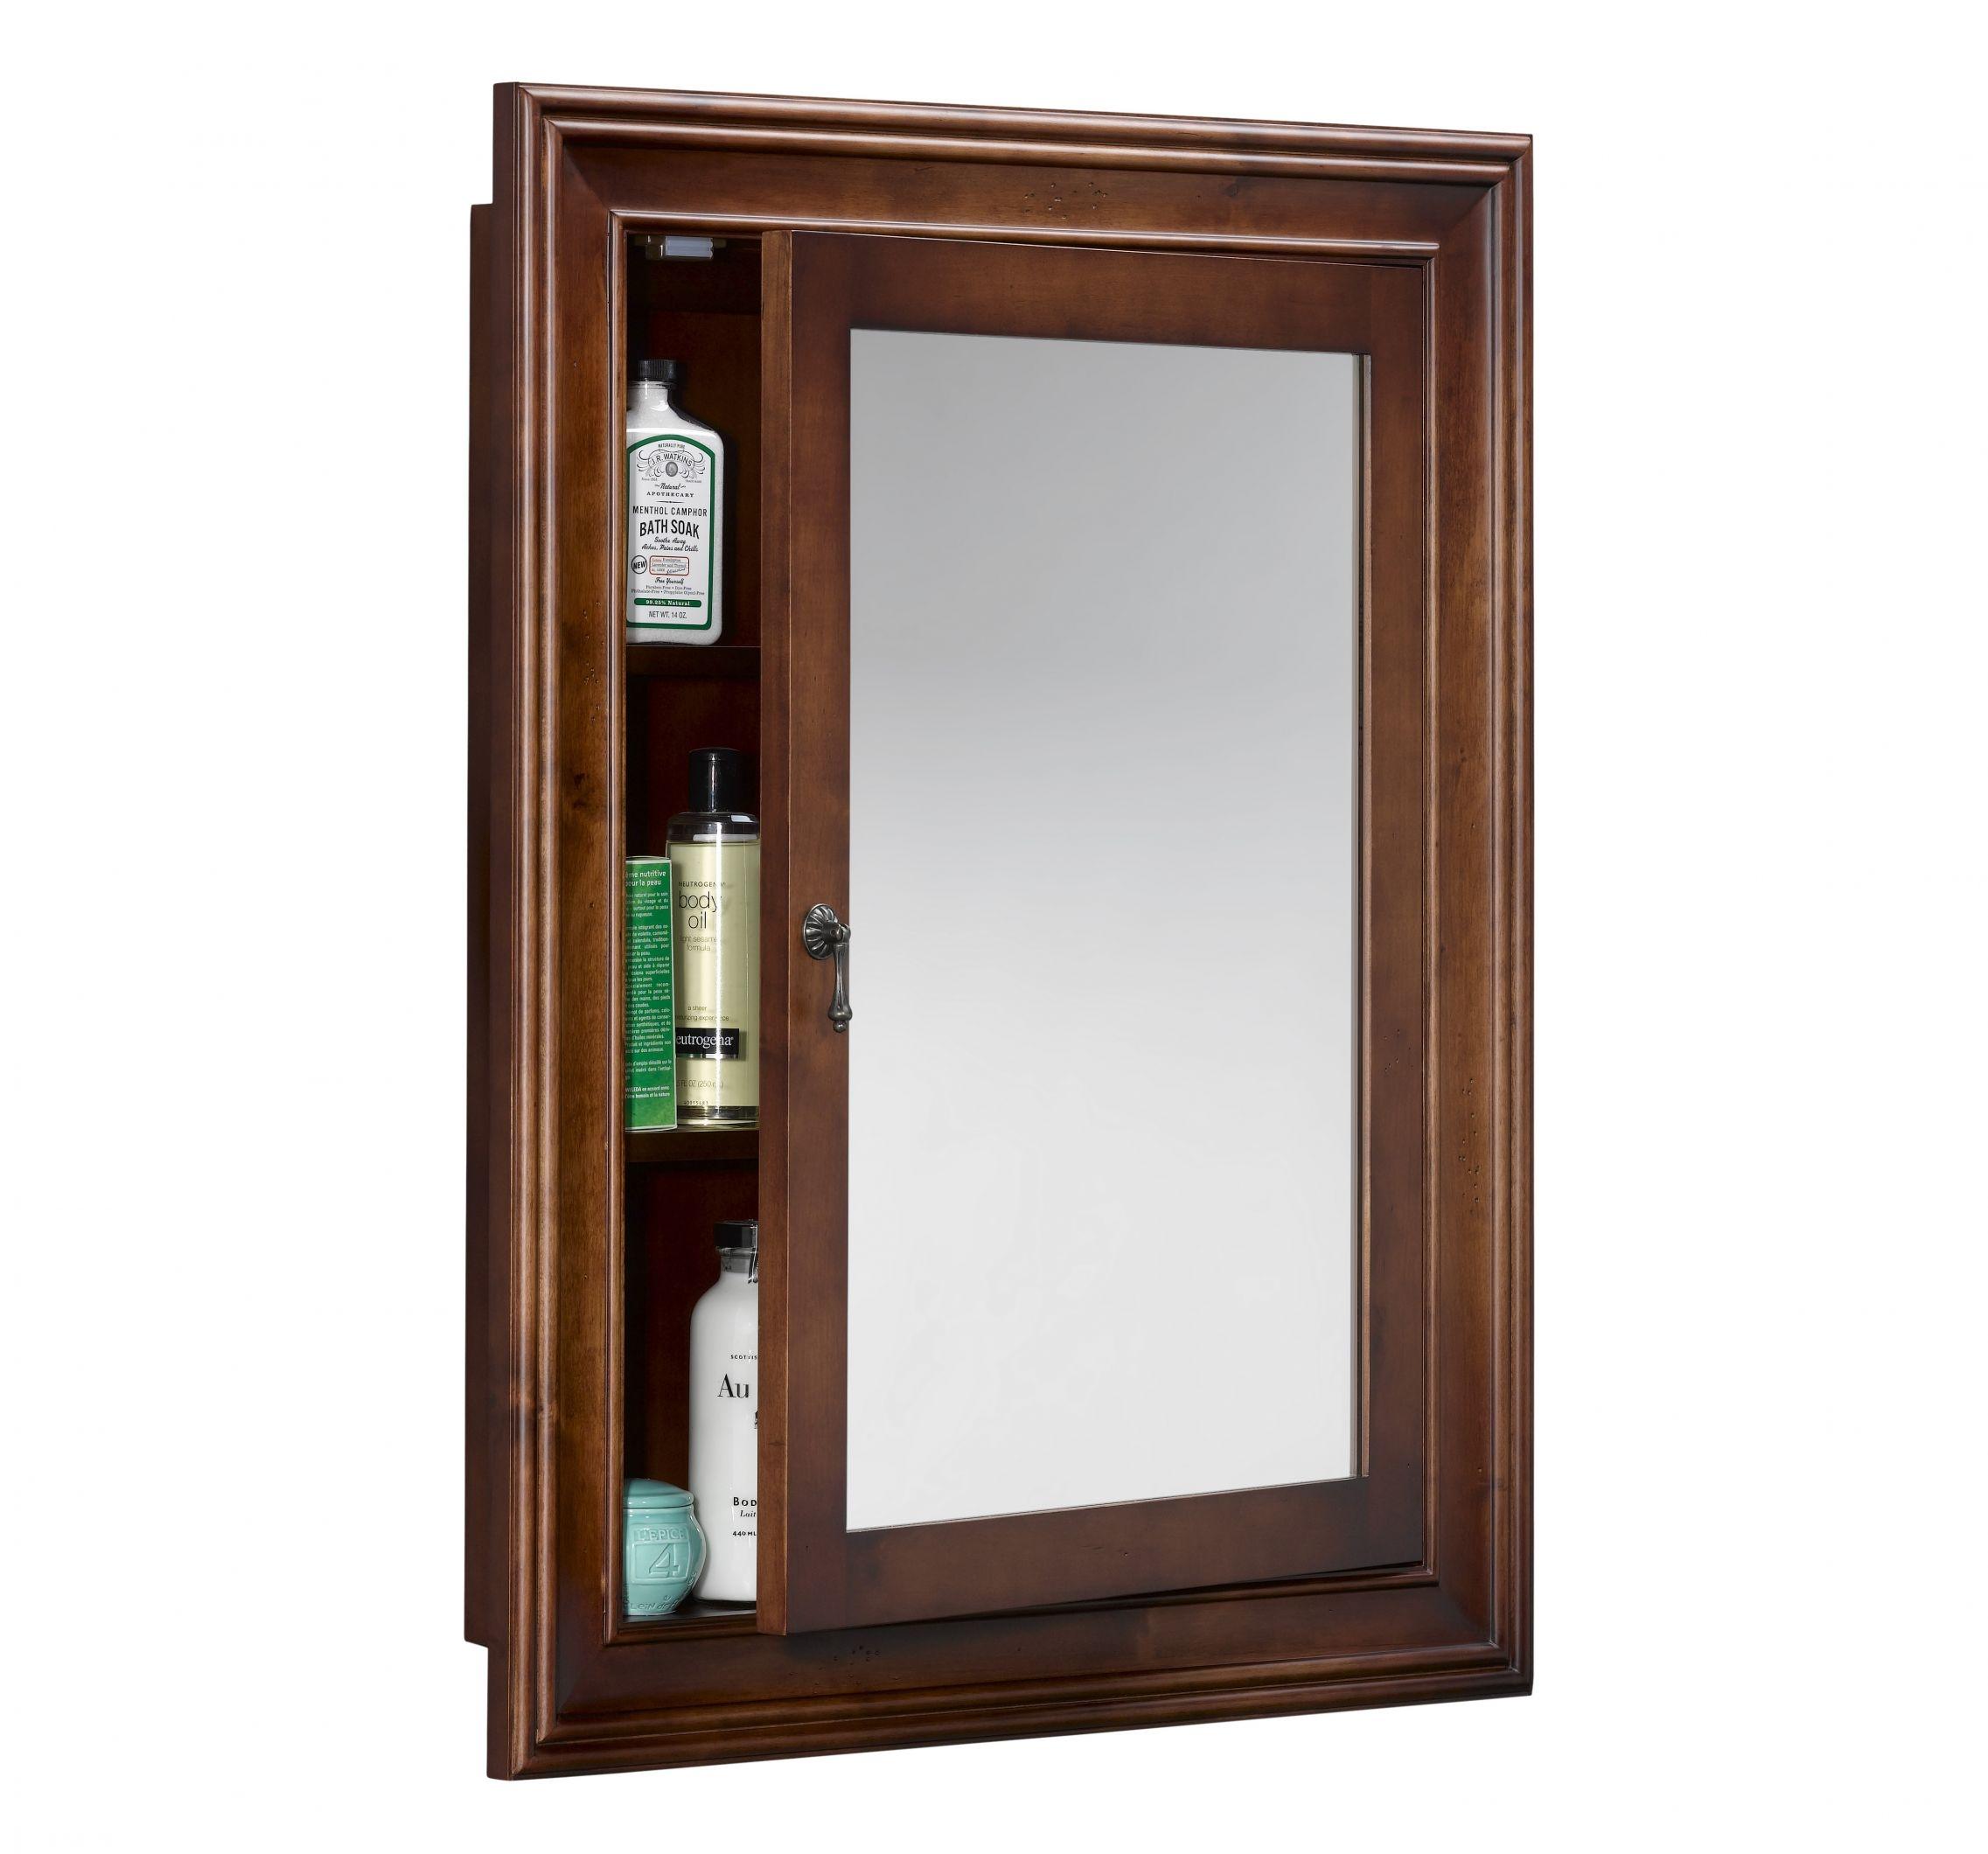 Wood Mirror Bathroom Cabinetlargest611027 f11medicinecabinet3